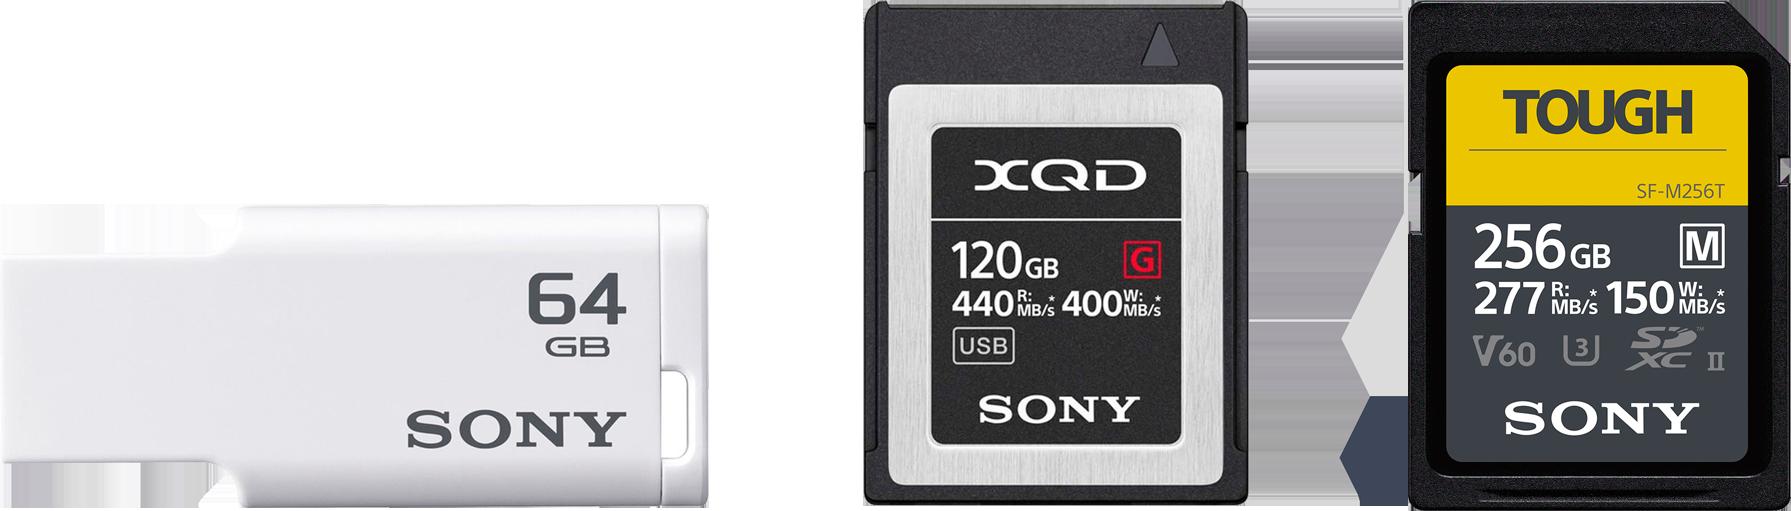 Sony Data Recovery